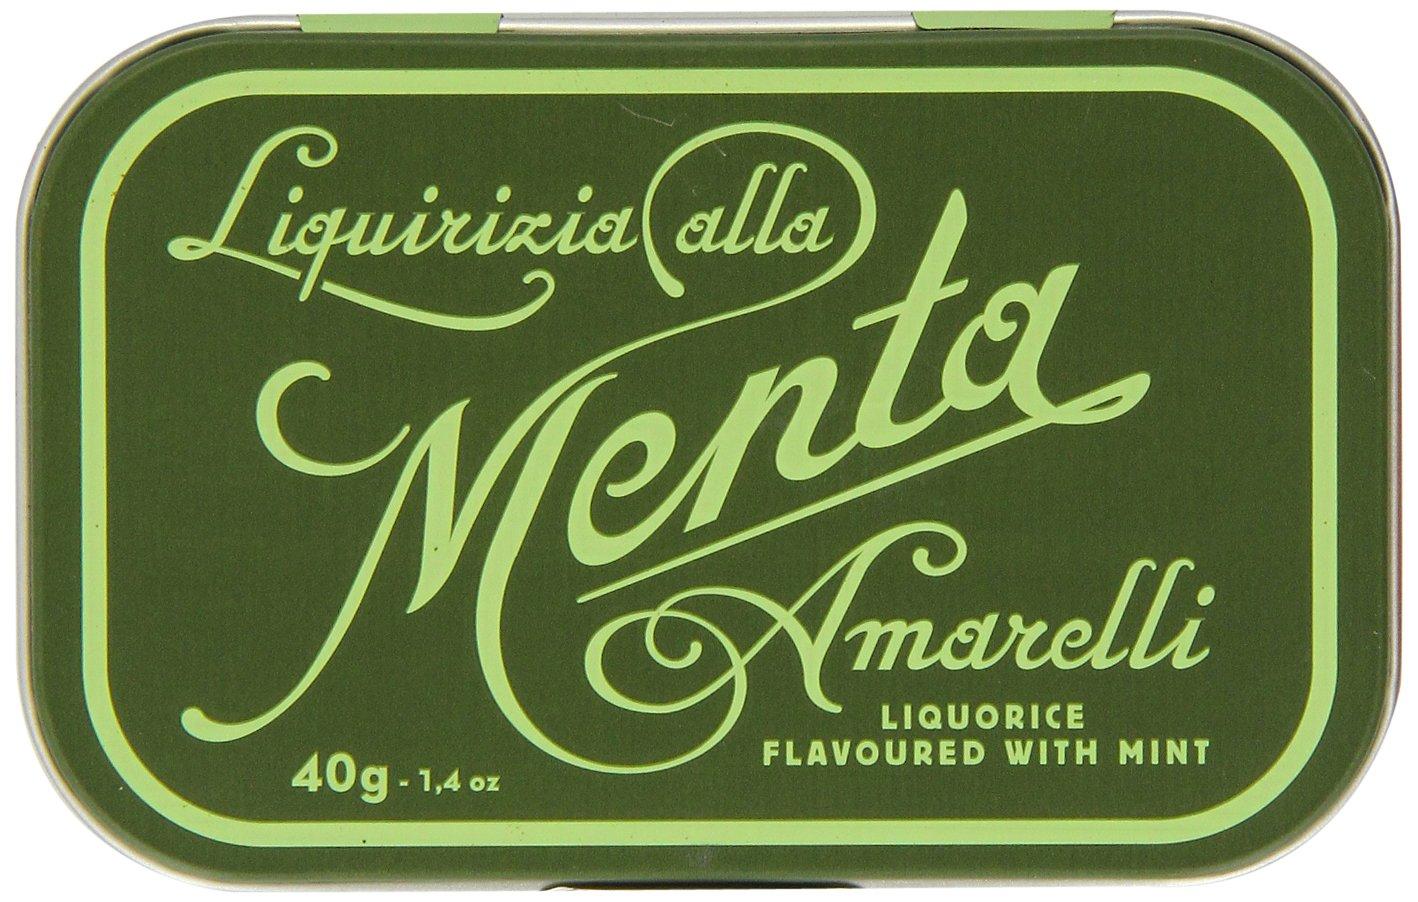 Amarelli Mint Liquorice Green Tin 40 g (Pack of 3)